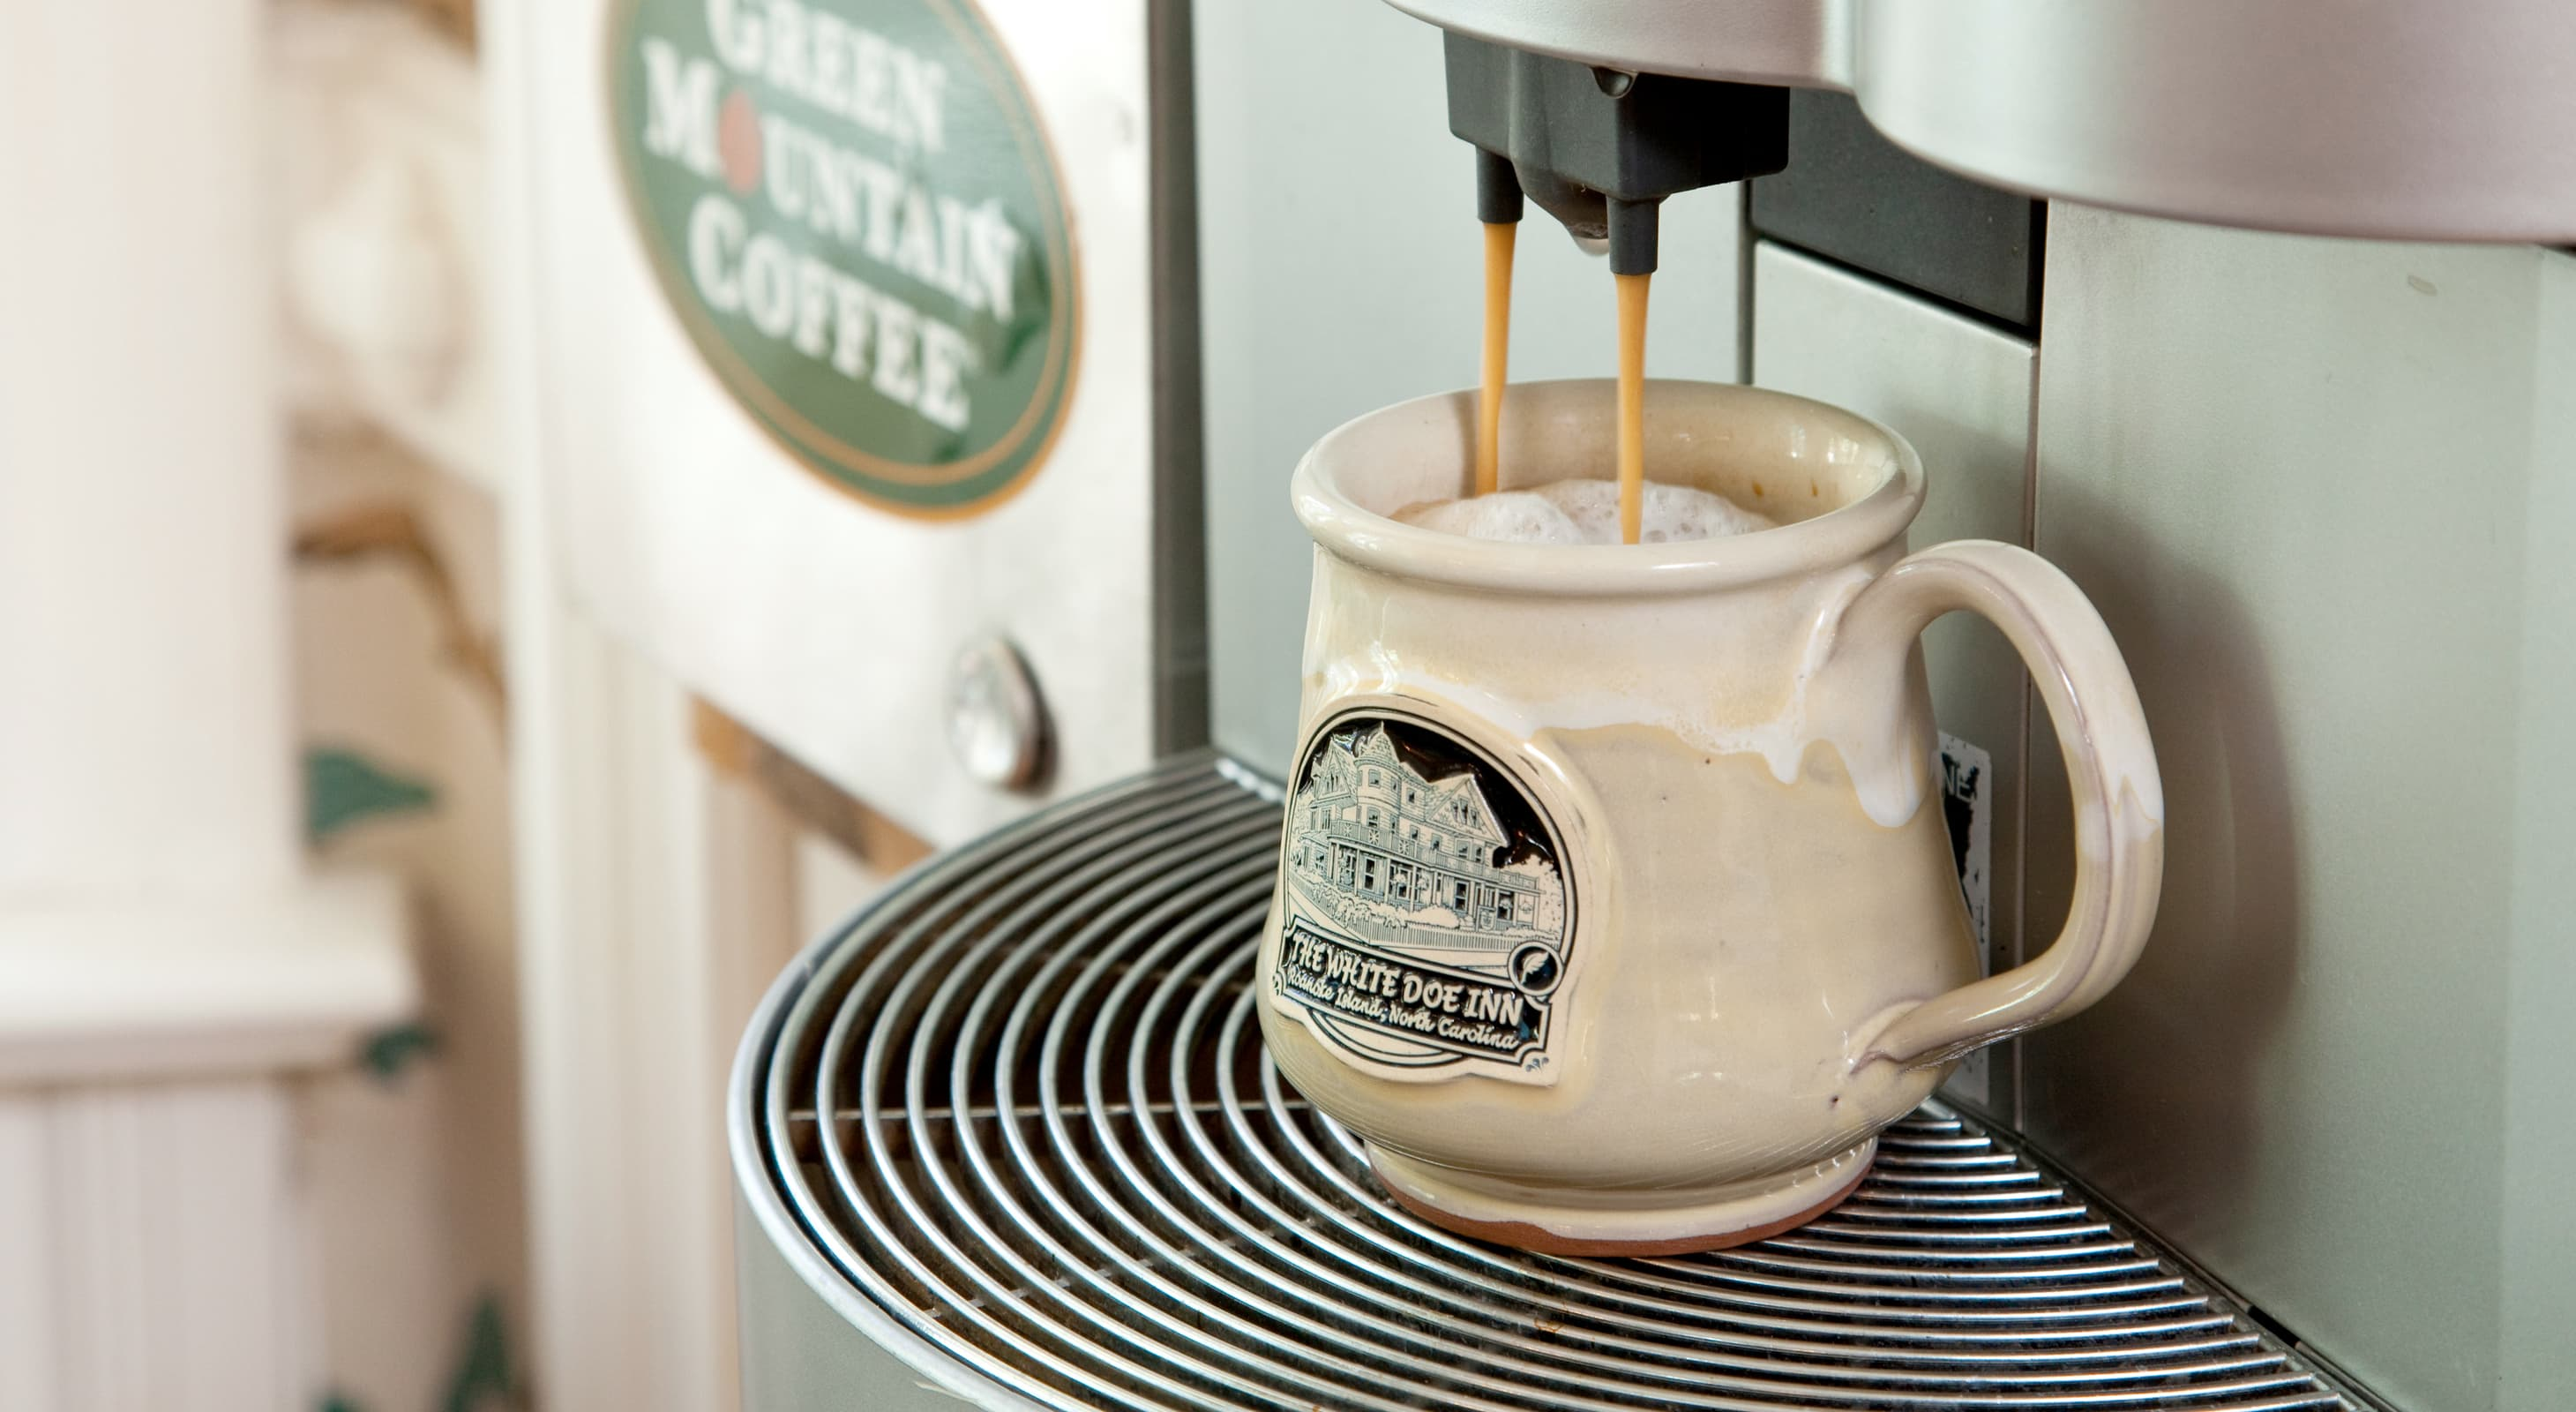 Coffee station at a Inn